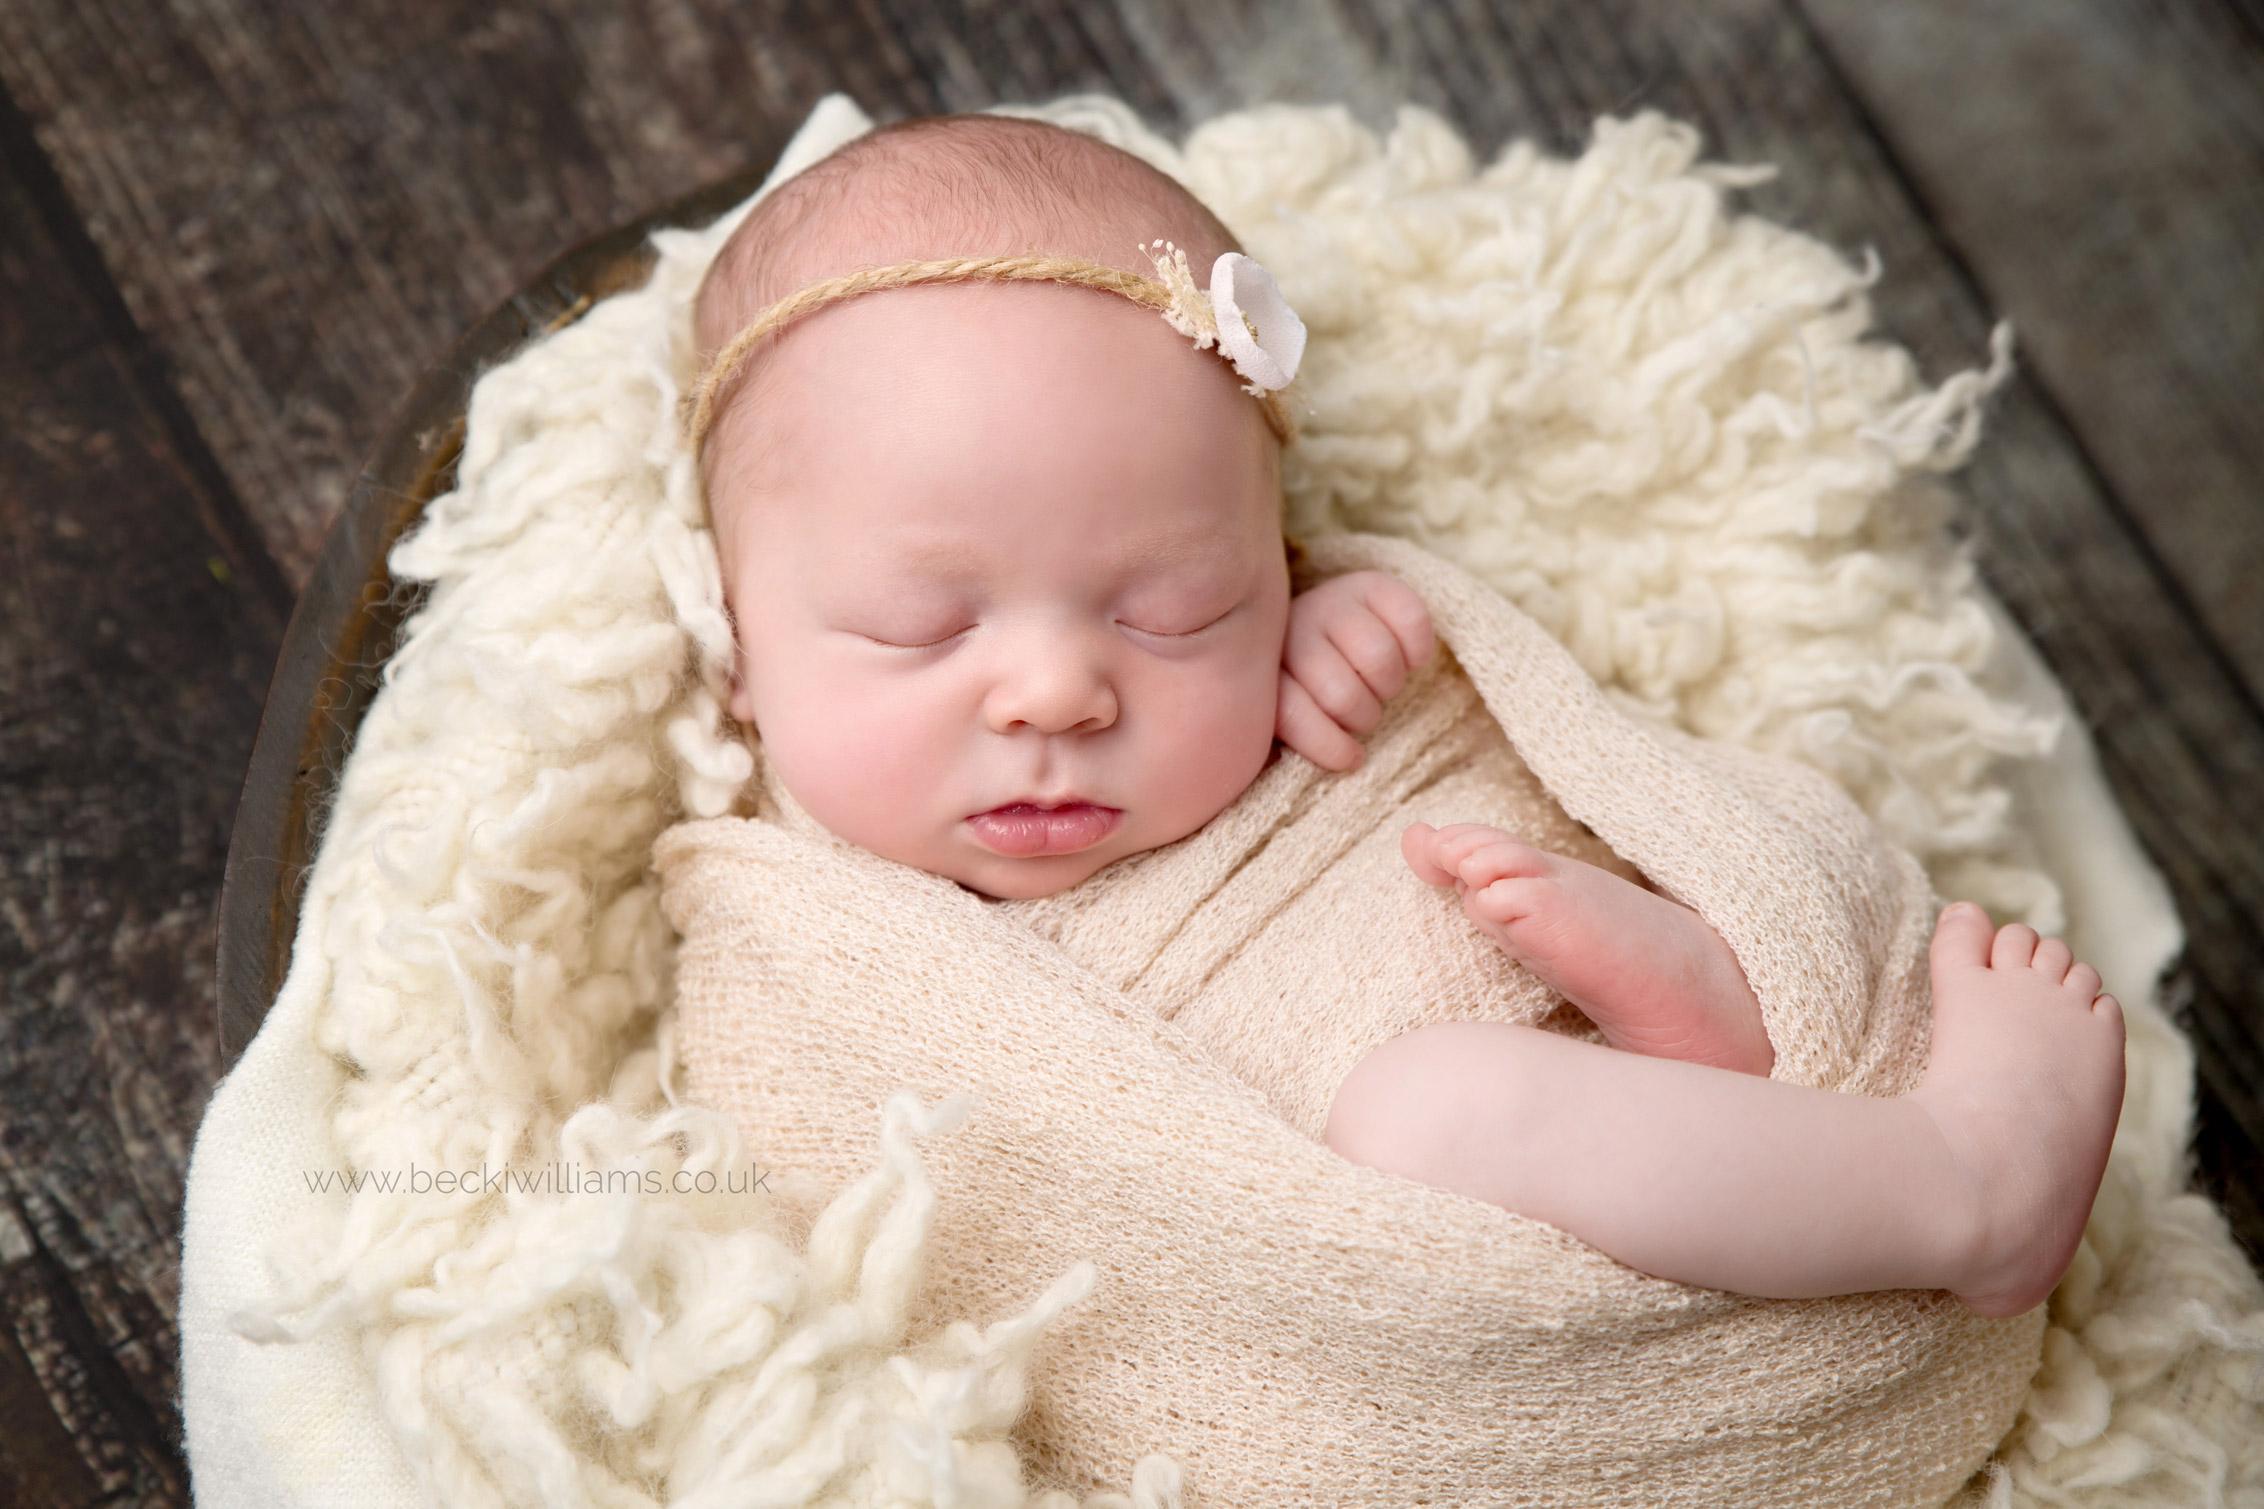 newborn-photography-hemel-hempstead-wrapped-cream-cute-prop-asleep.jpg